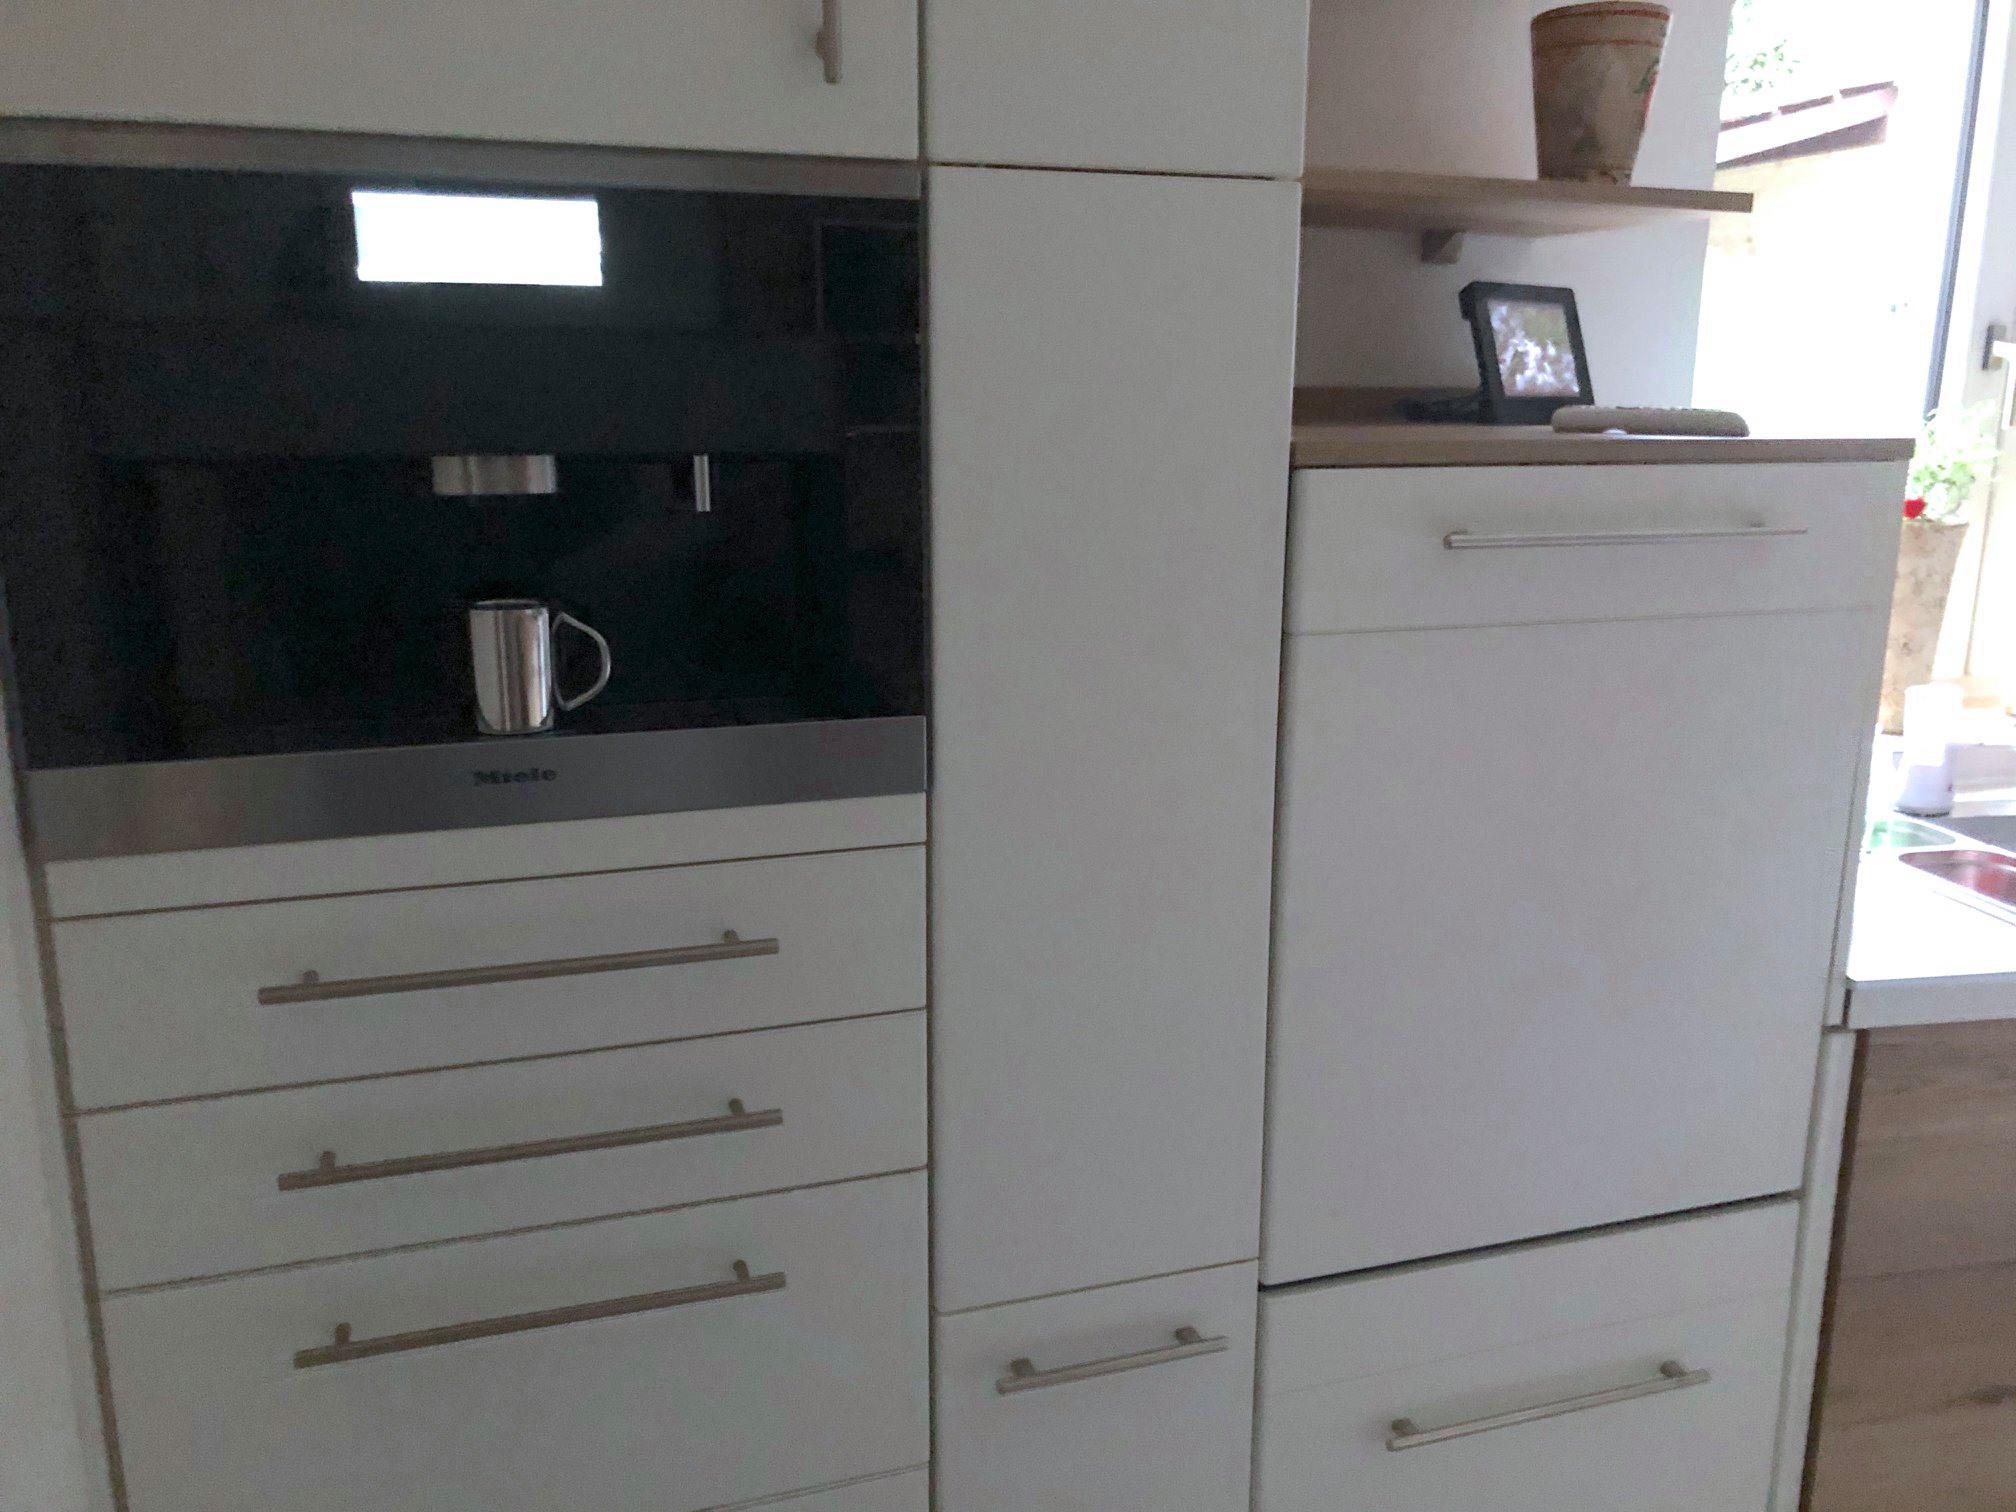 Kaffee-Automat mit Festwasseranschluss